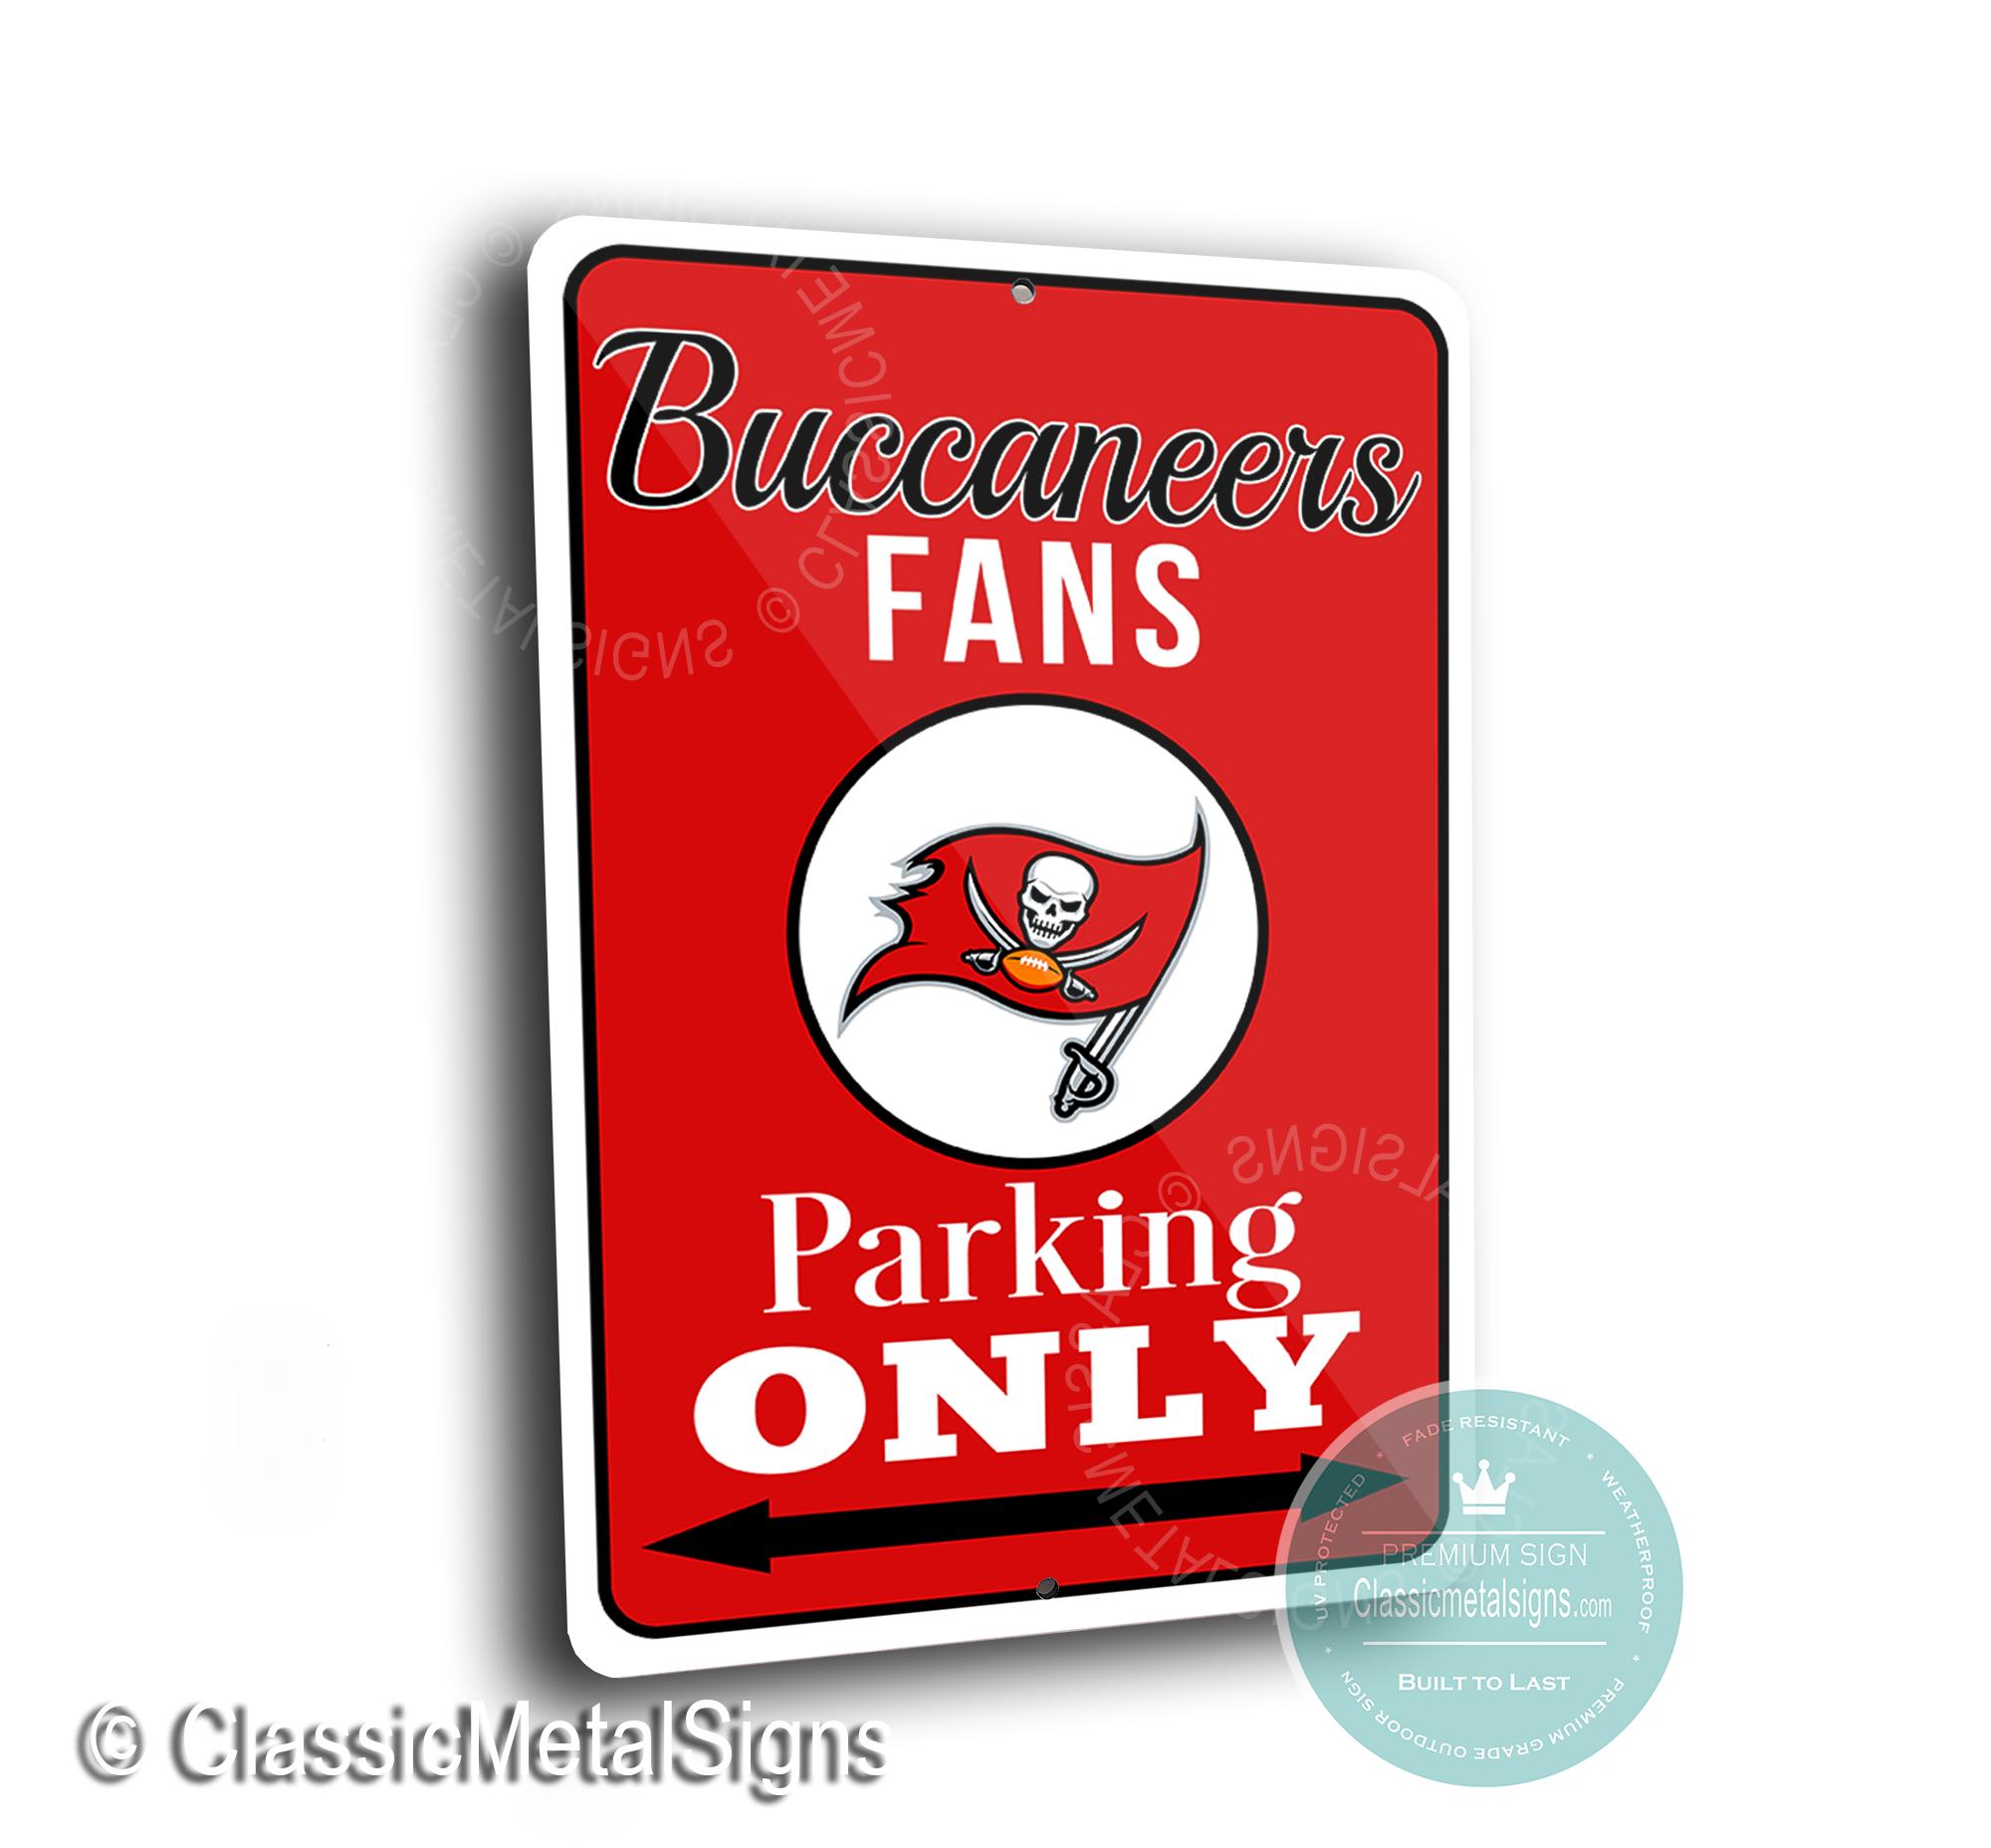 Tampa Bay Buccaneers Parking Signs